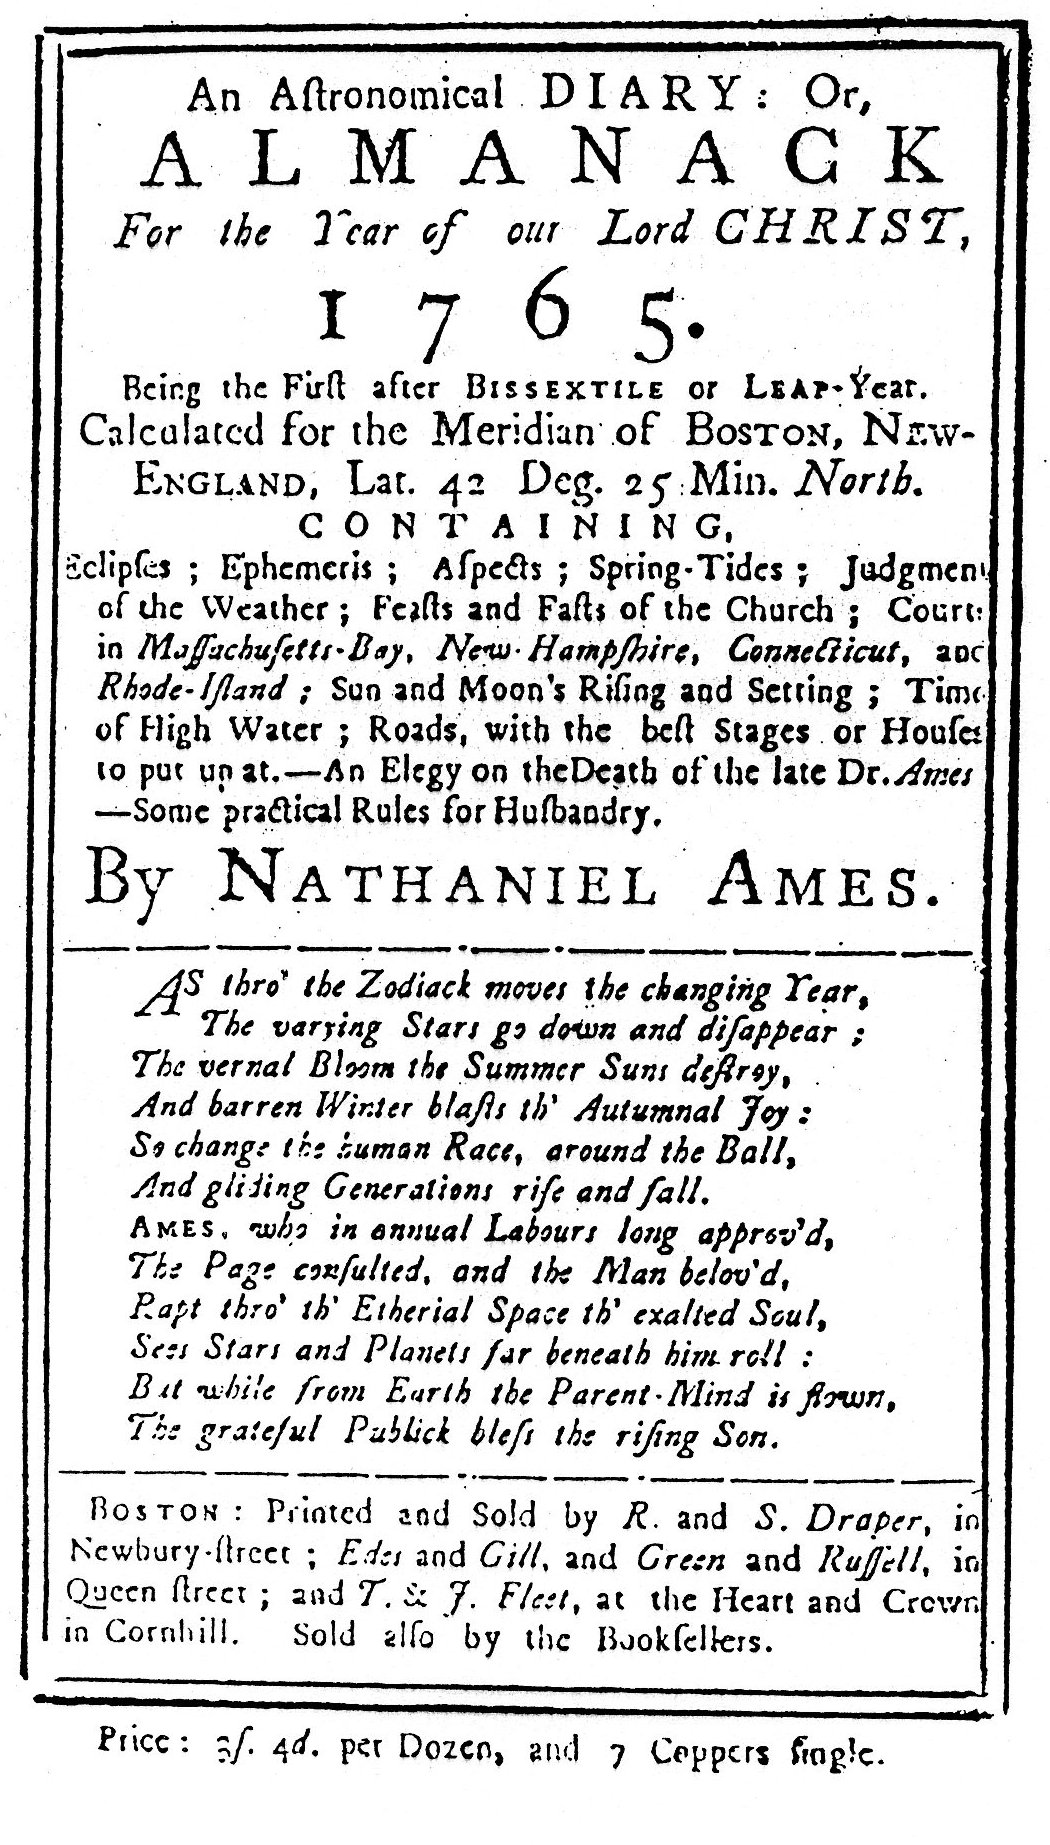 Ames' Almanack for 1765